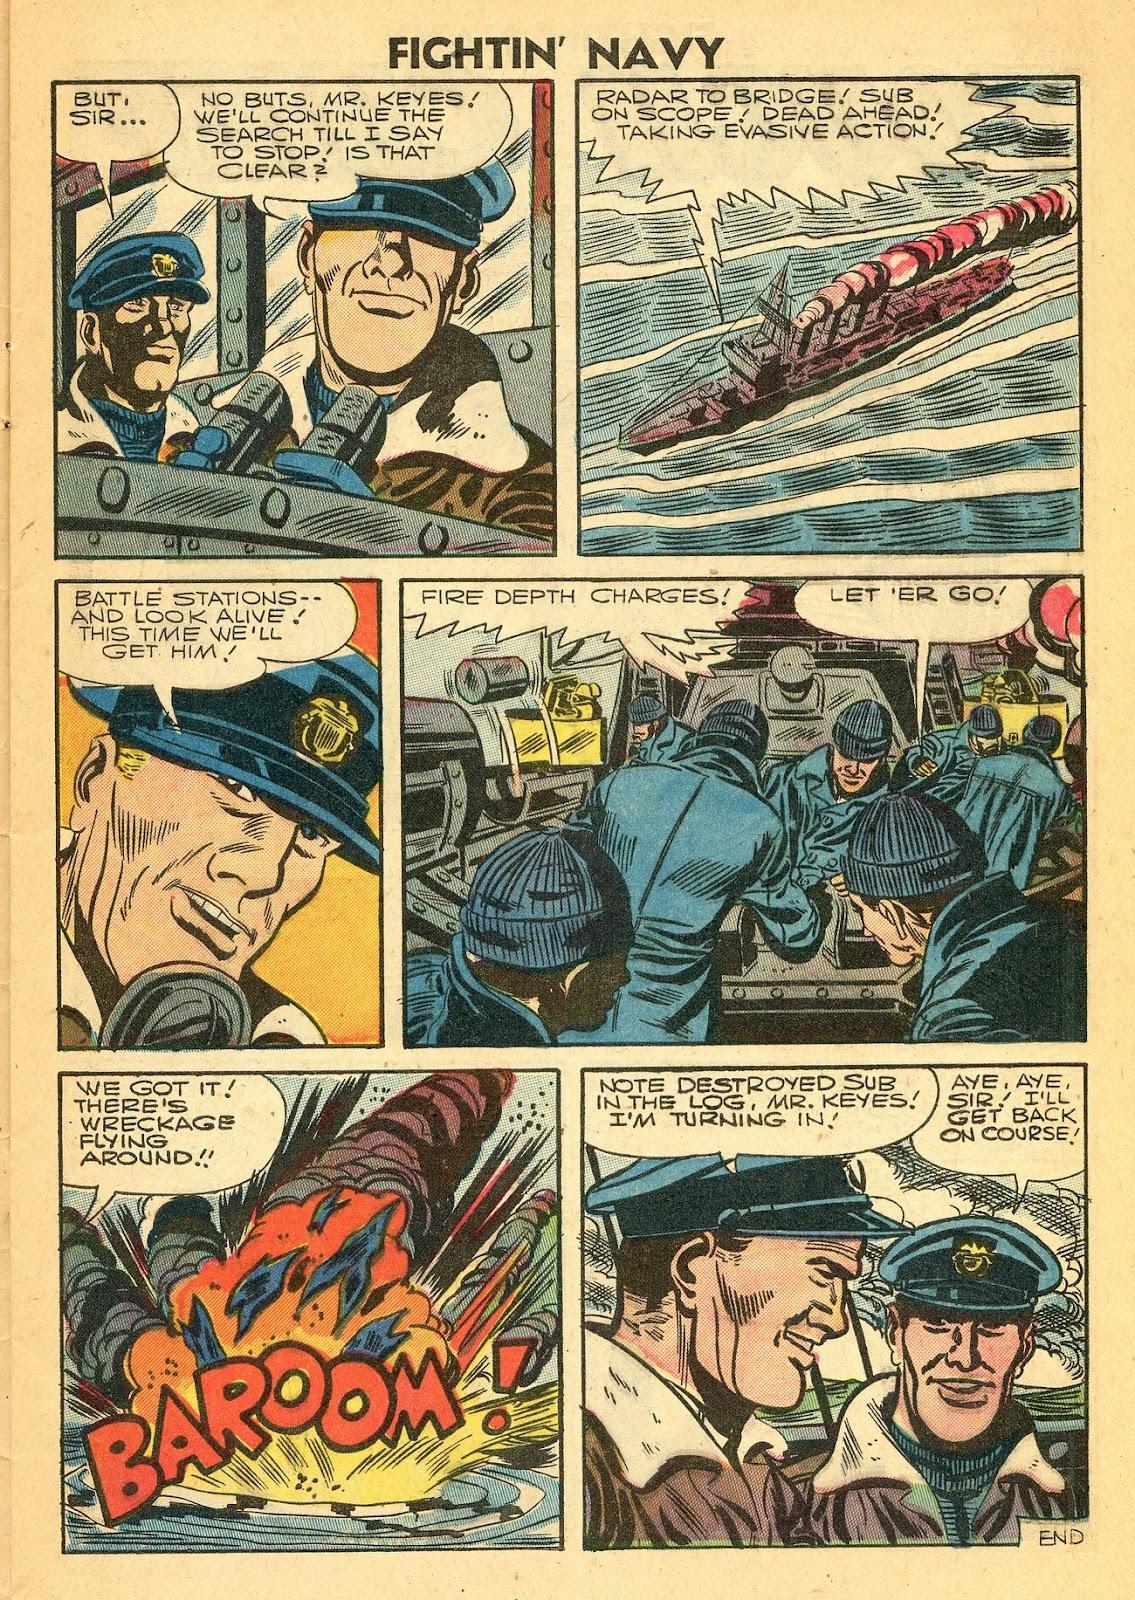 Read online Fightin' Navy comic -  Issue #77 - 9